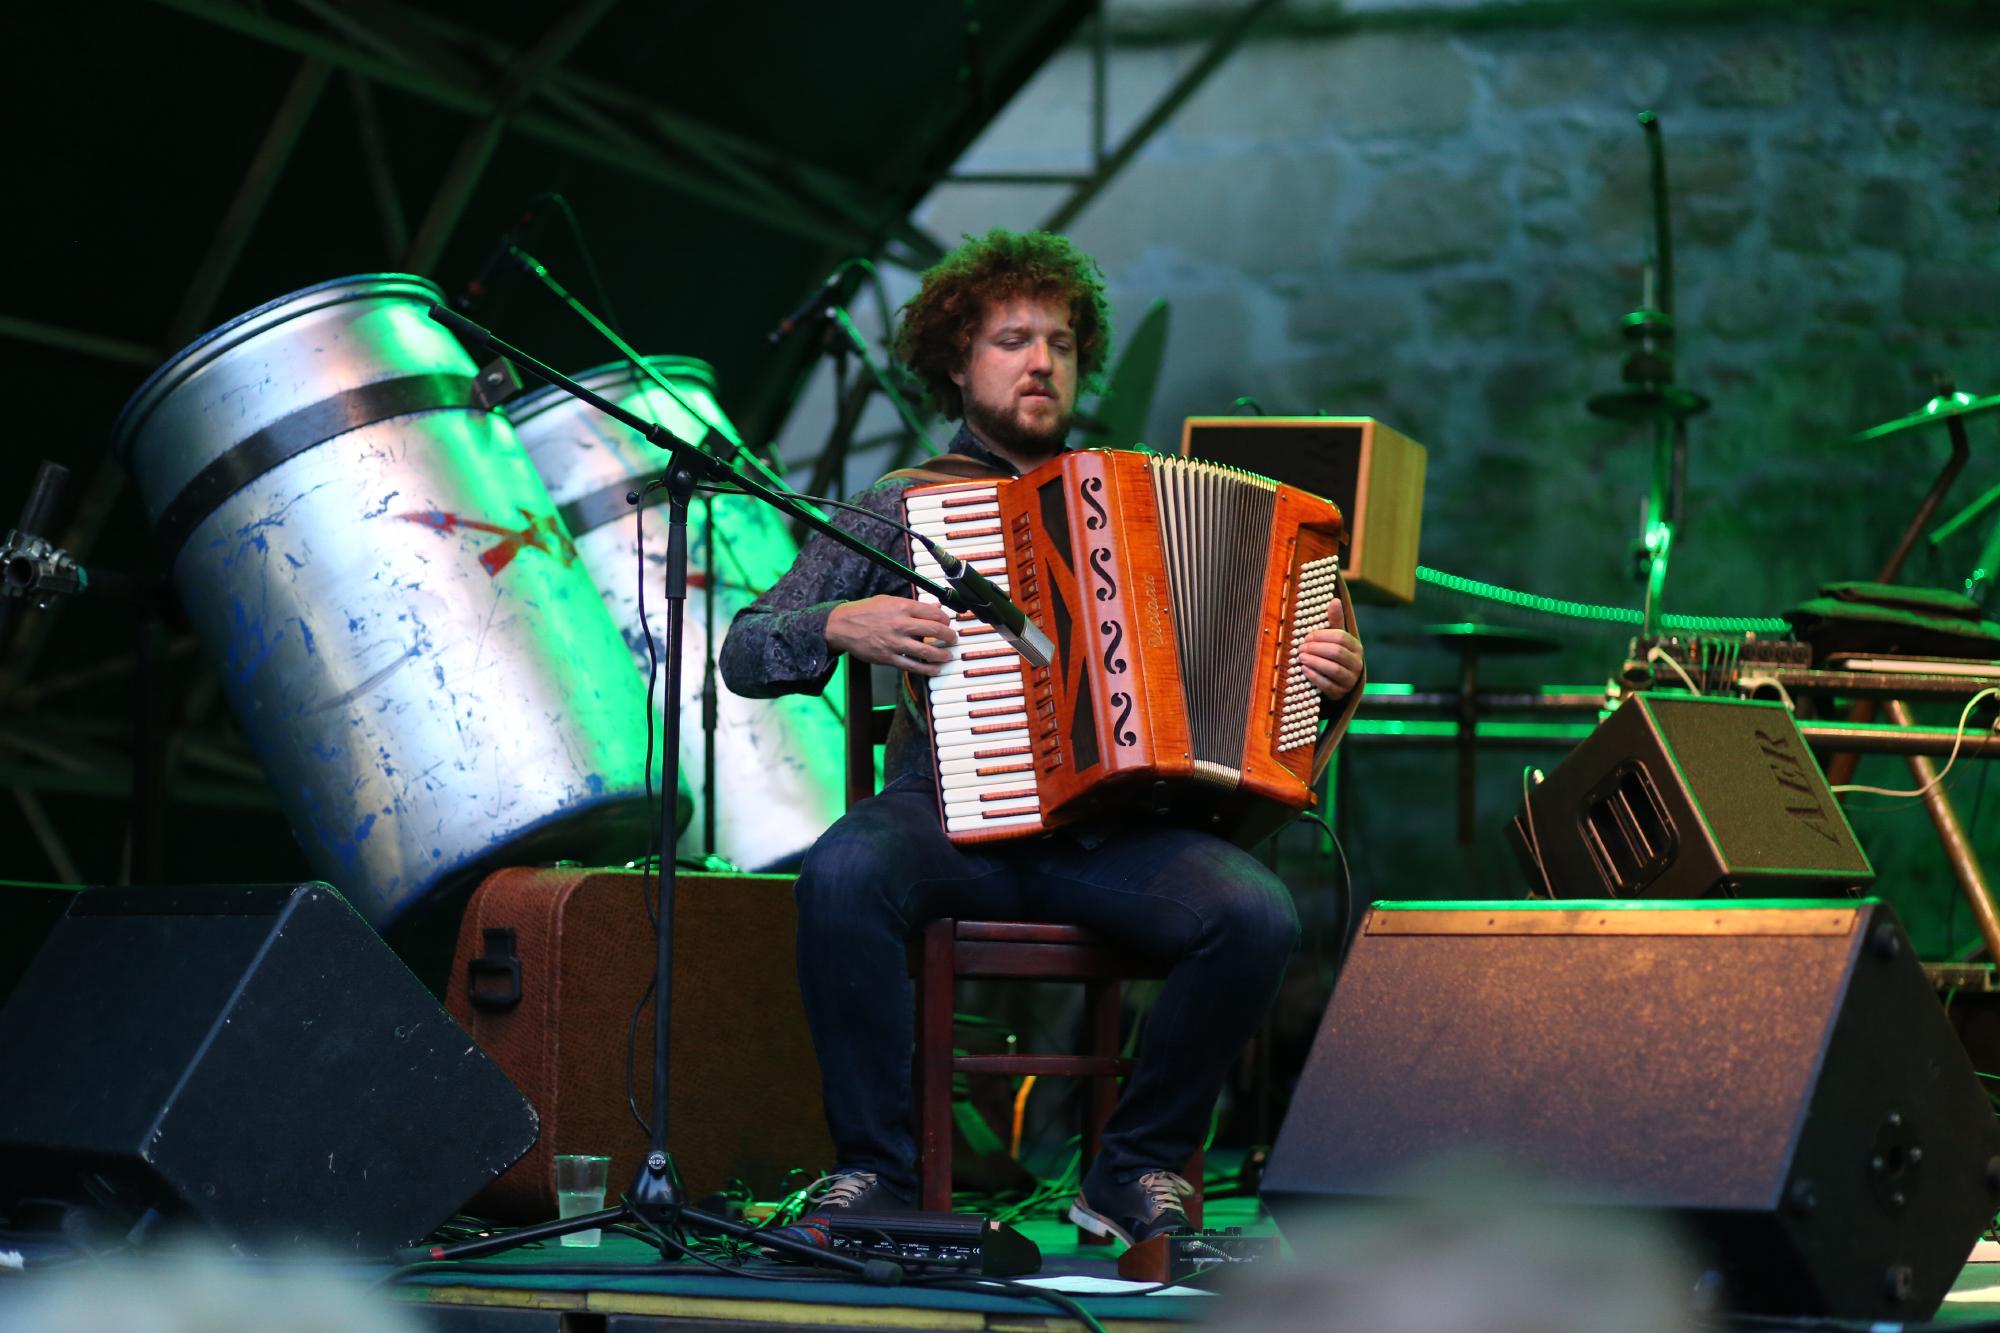 Andreja Ravnak